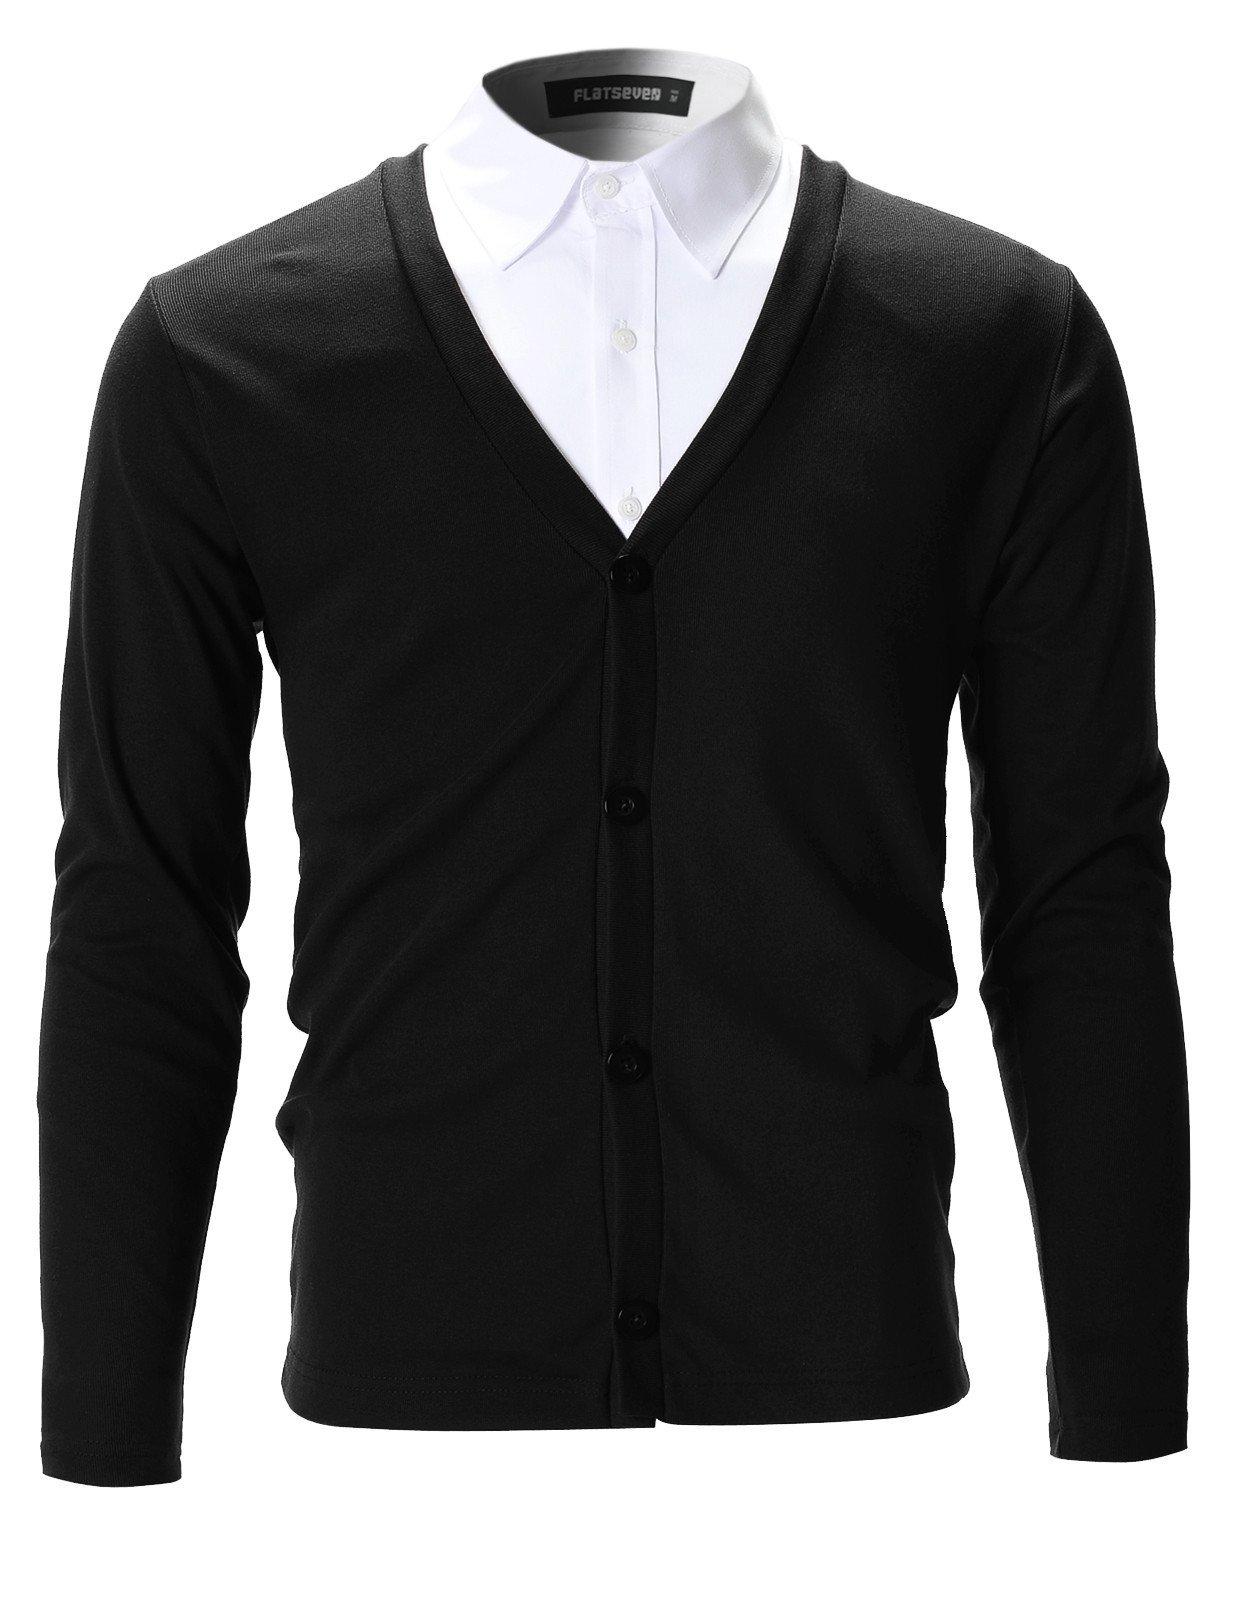 FLATSEVEN Mens Slim Fit Stylish Button up Cardigan (C100) Black, XS